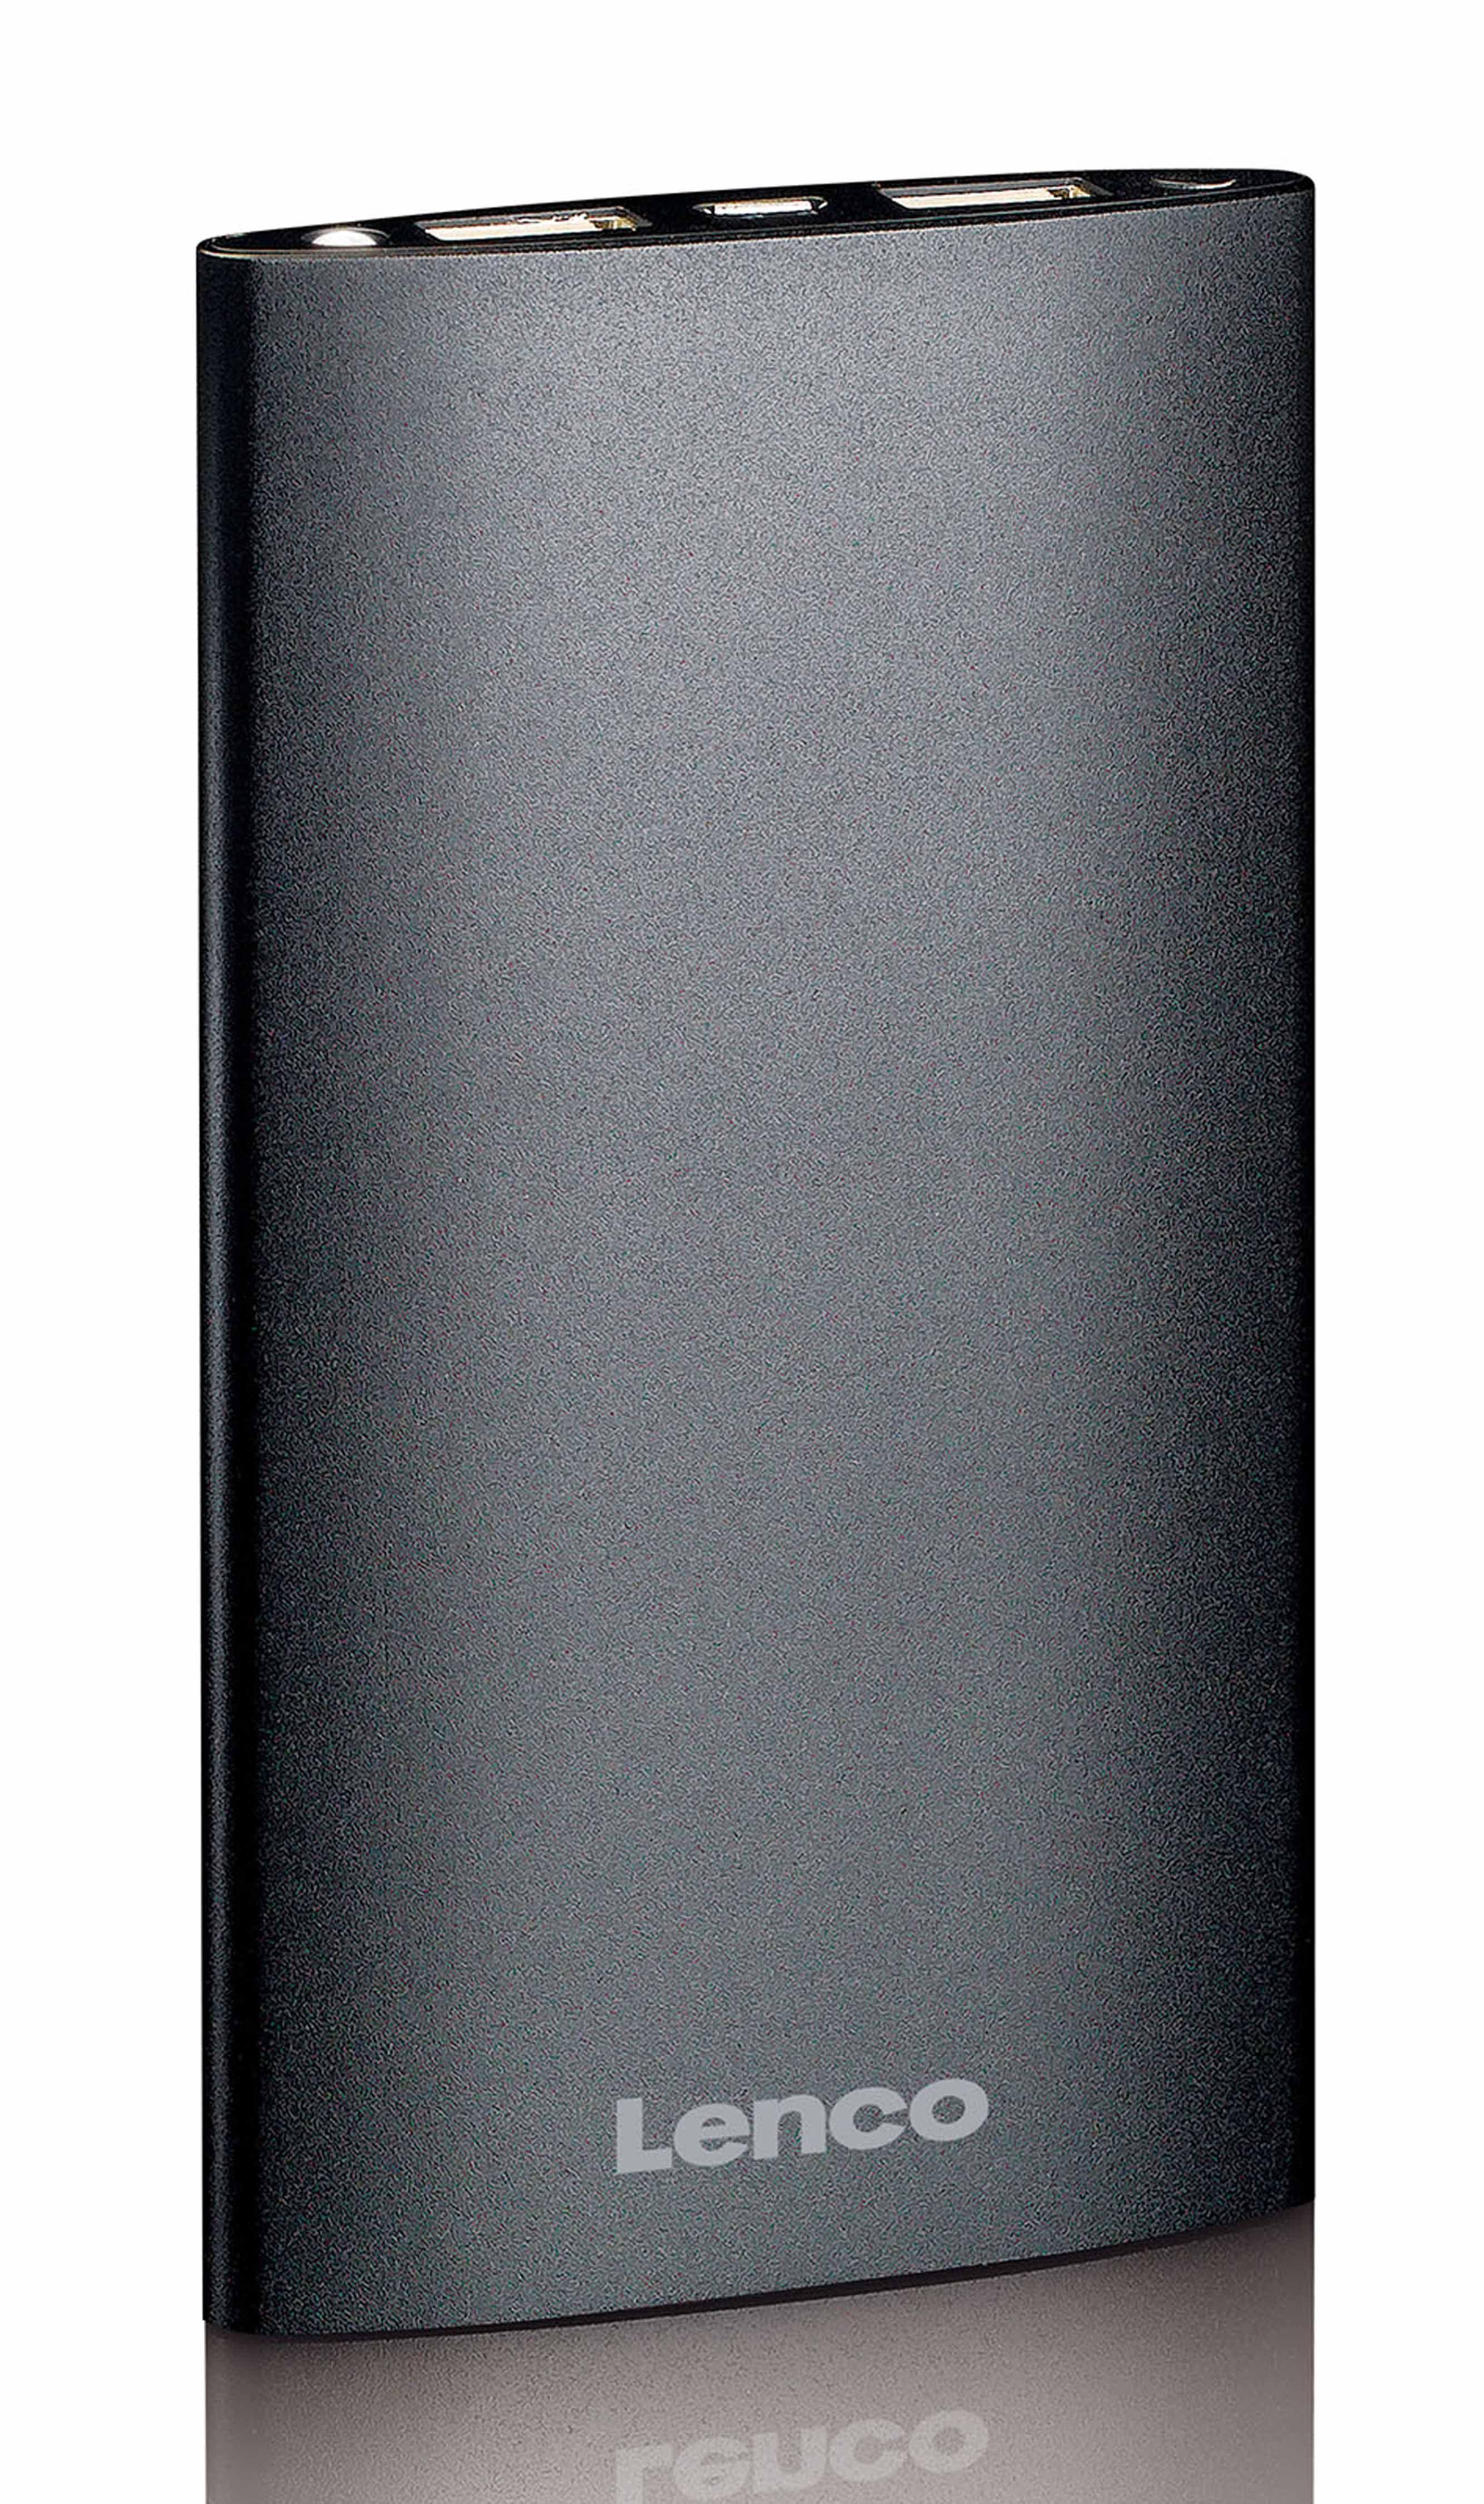 Lenco Powerbank - Akkupack mit Status-LEDs & Taschenlampe »PB-610«